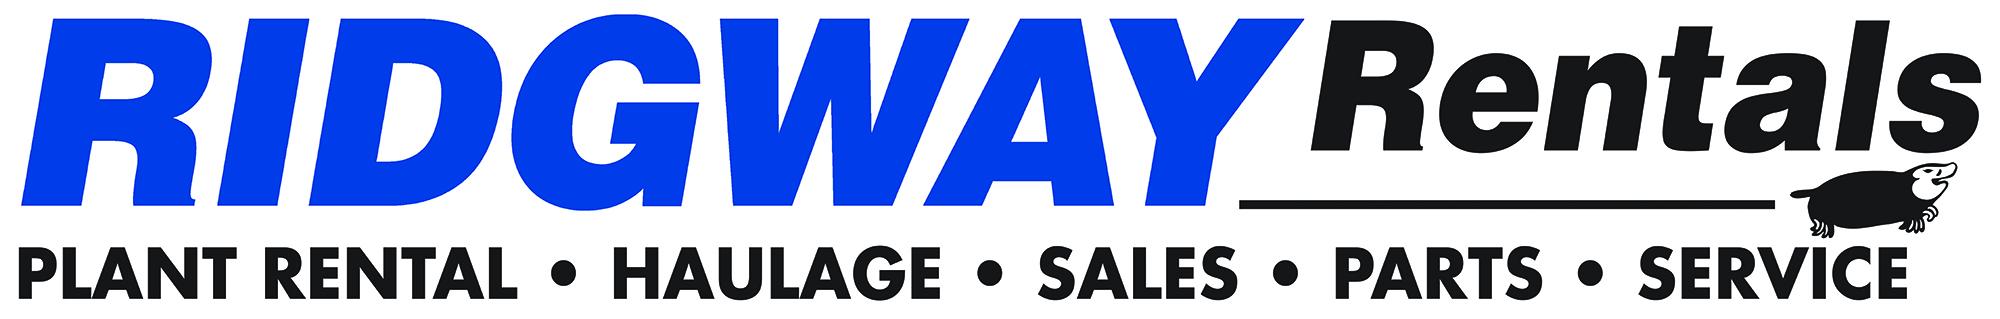 Ridgway Rentals